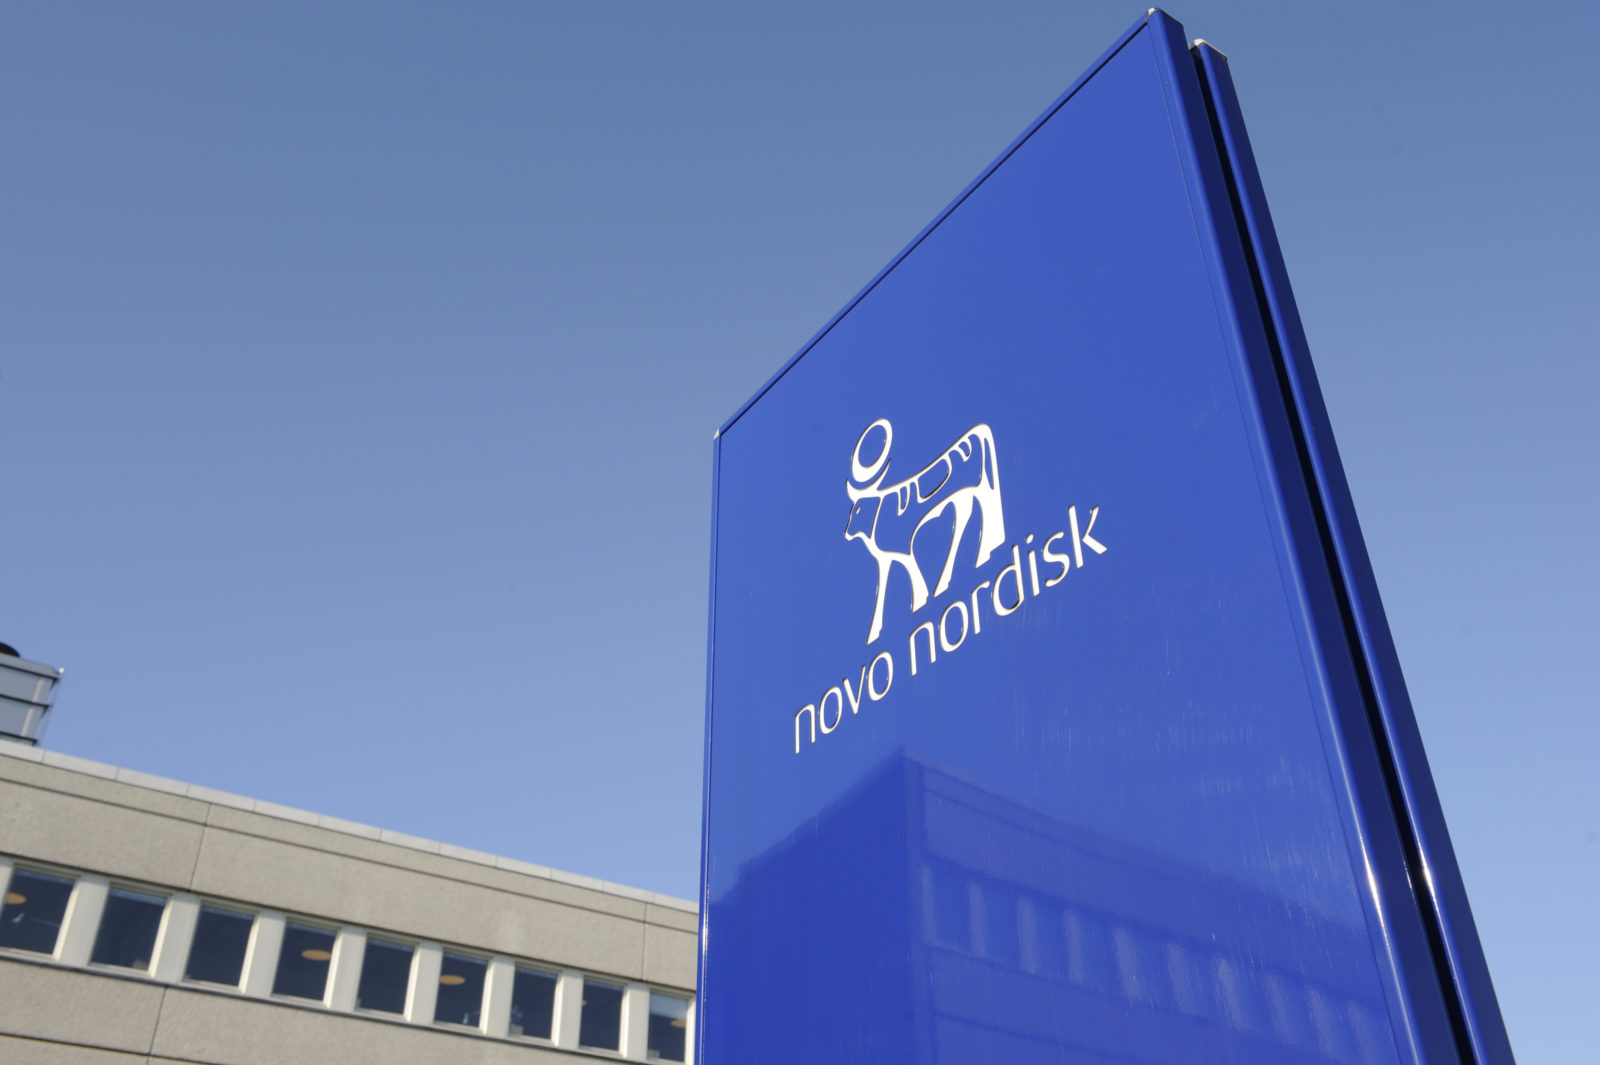 novo-nordisk-inova-ao-promover-evento-cientifico-em-drive-in